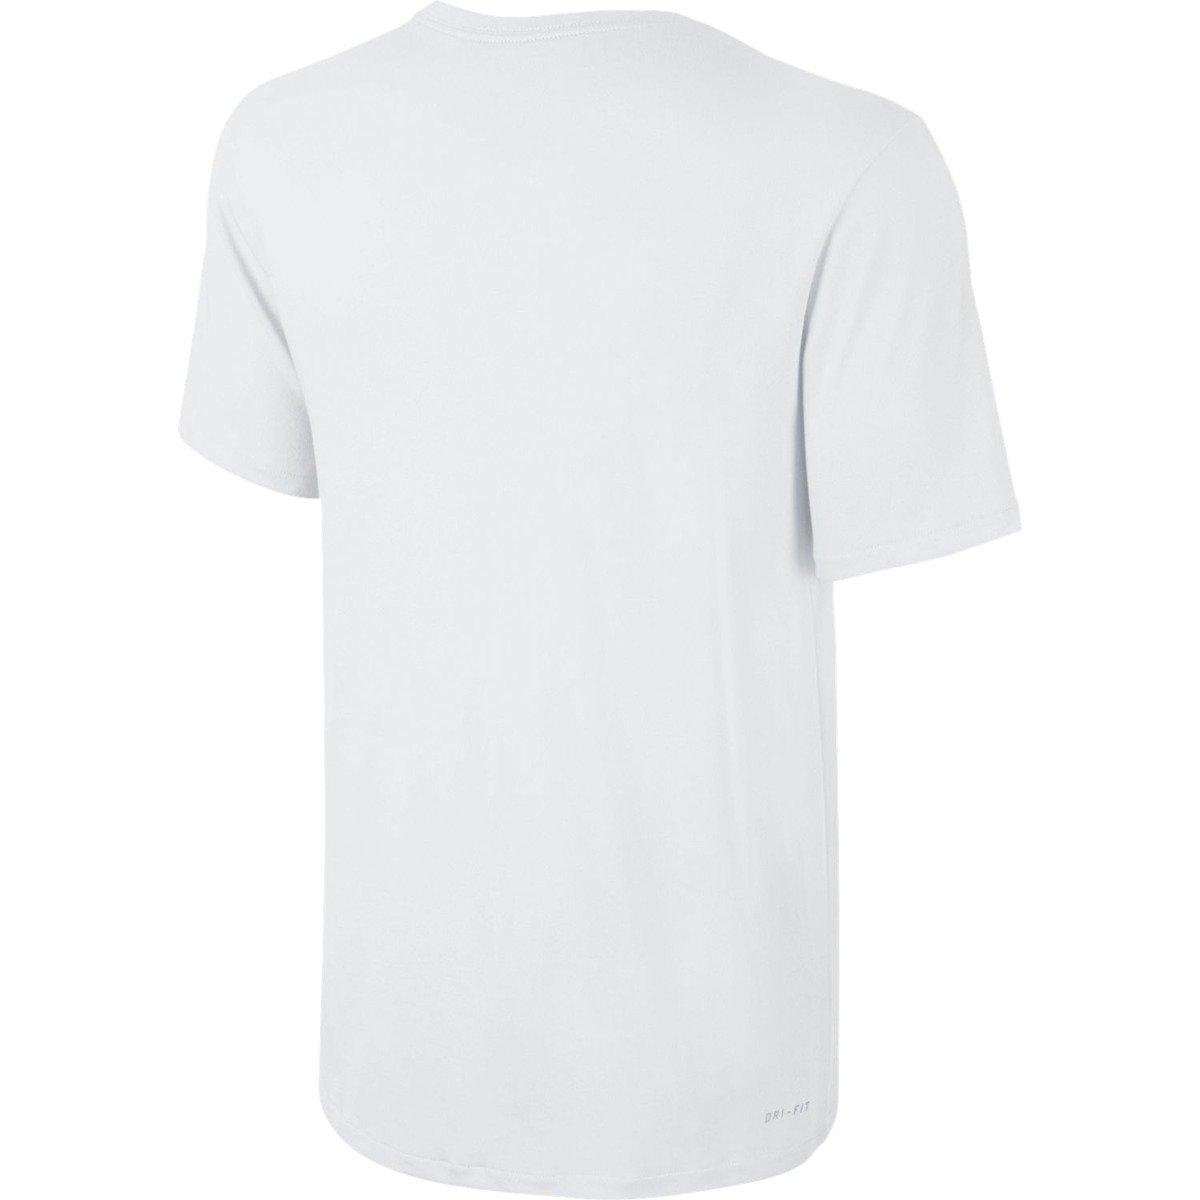 d8dcbb77db3f ... T-shirt Nike SB Dri-FIT Icon Logo Tee BLACK WHITE TUMBLED Click to zoom